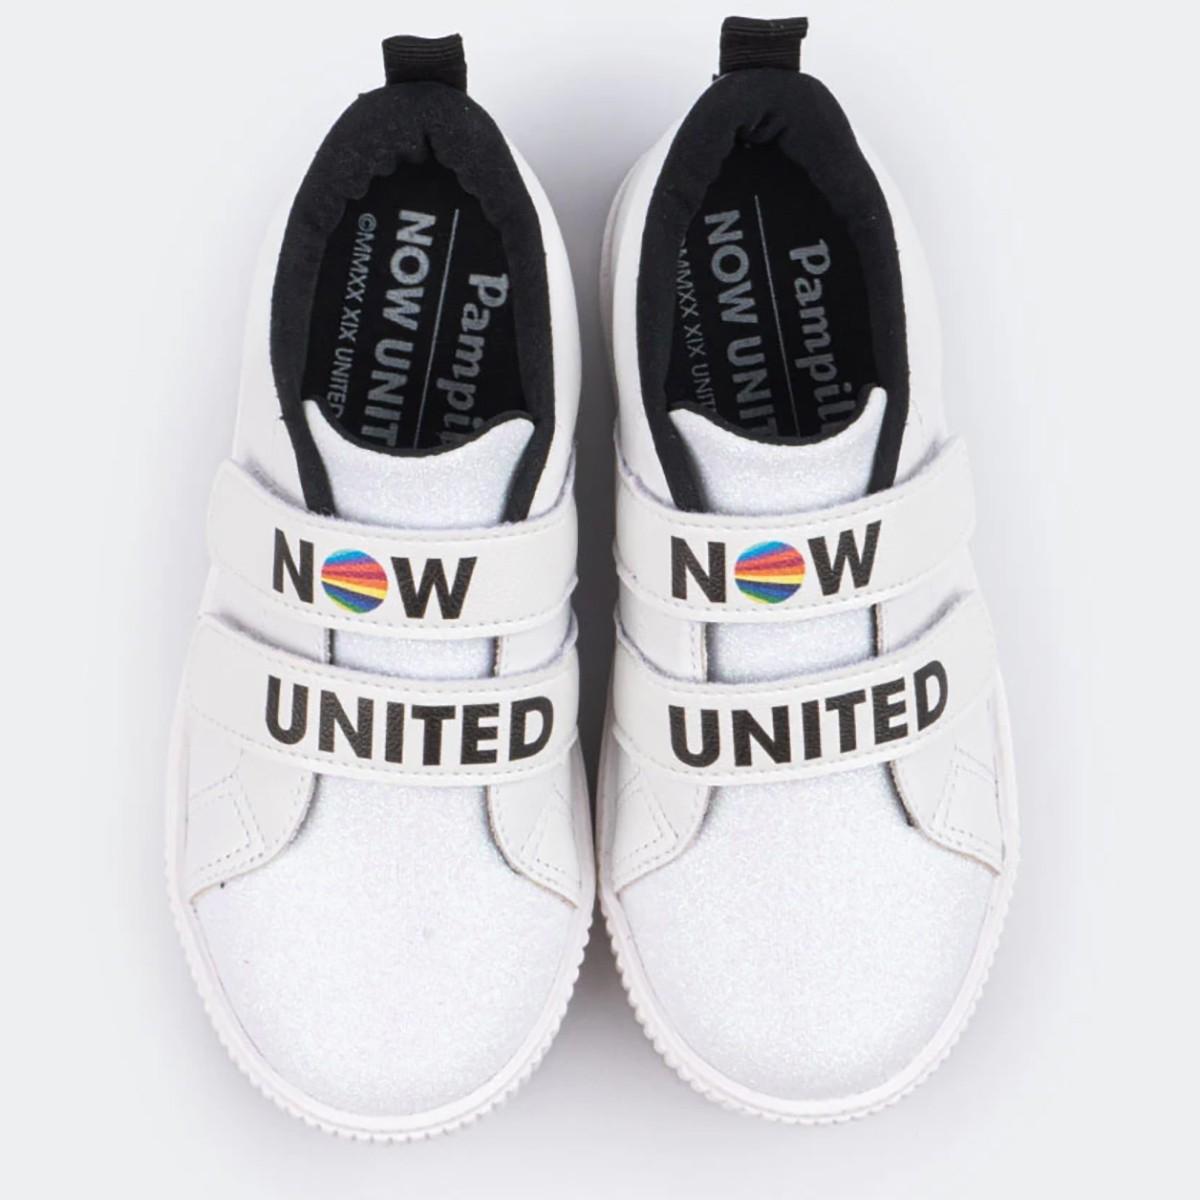 Tenis Pampili Now United Luna Velcro Branco